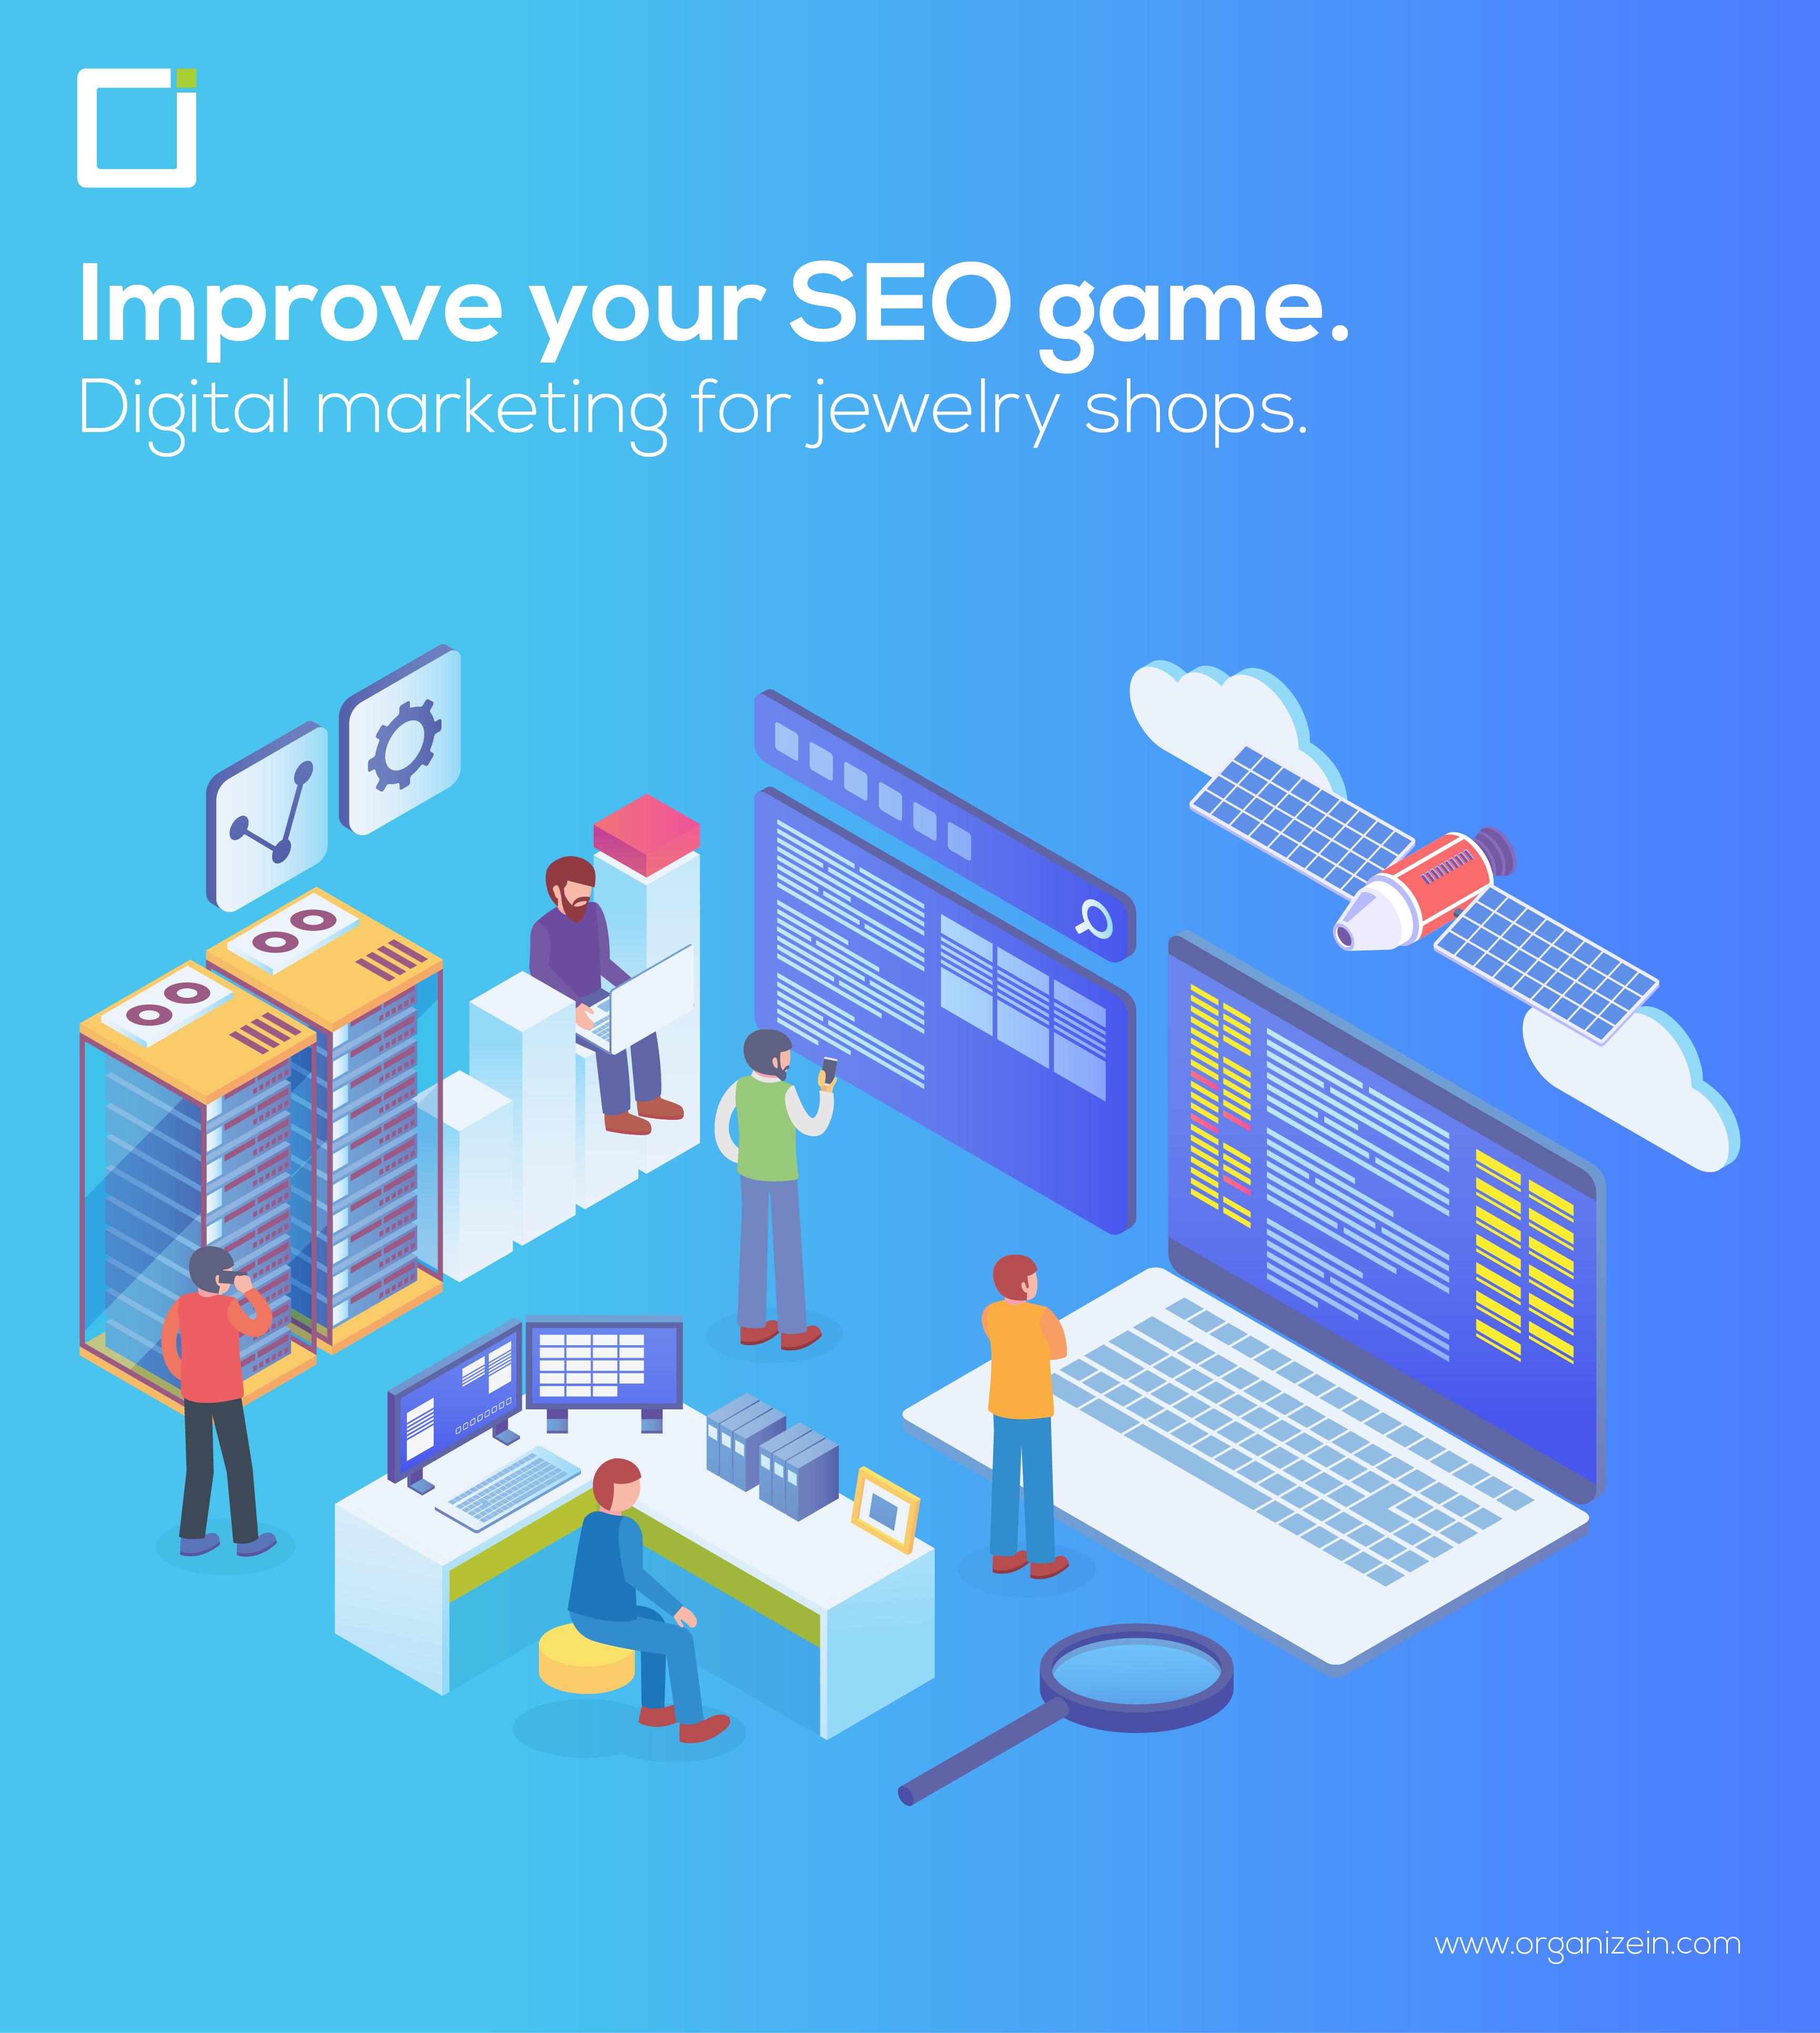 Digital marketing for jewelry shops